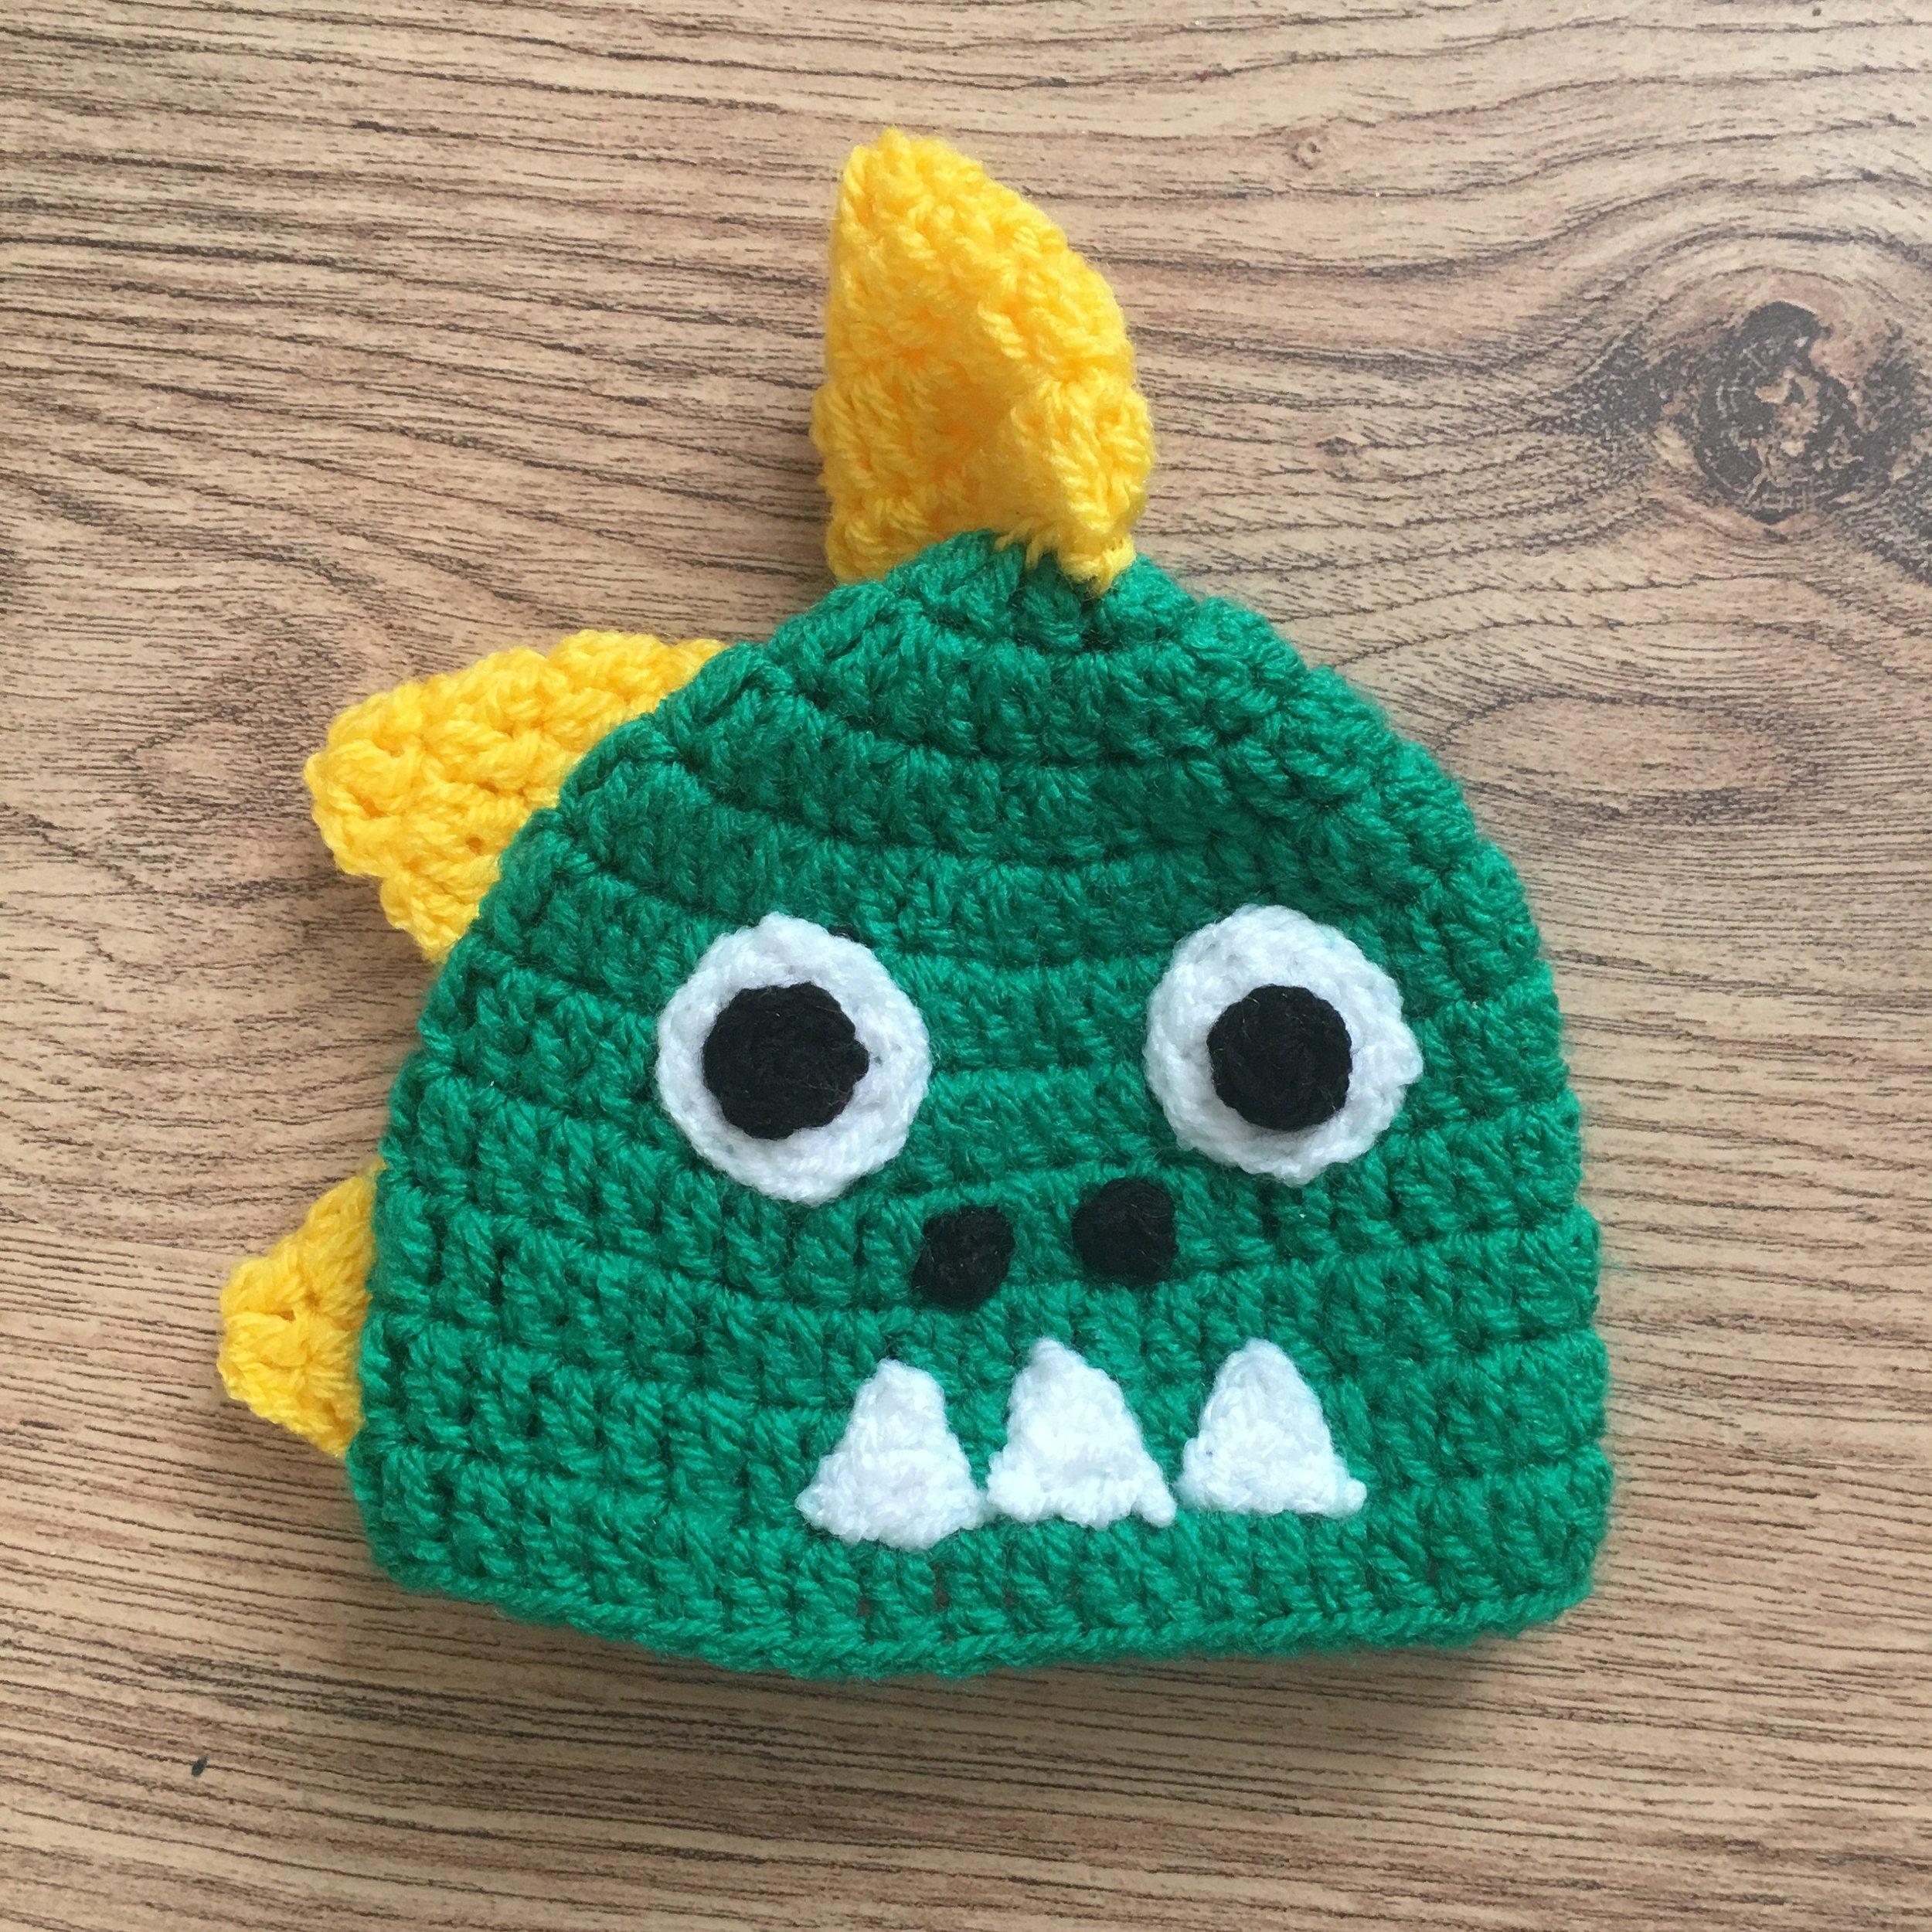 yay-for-crochet-dragon-hat.jpg